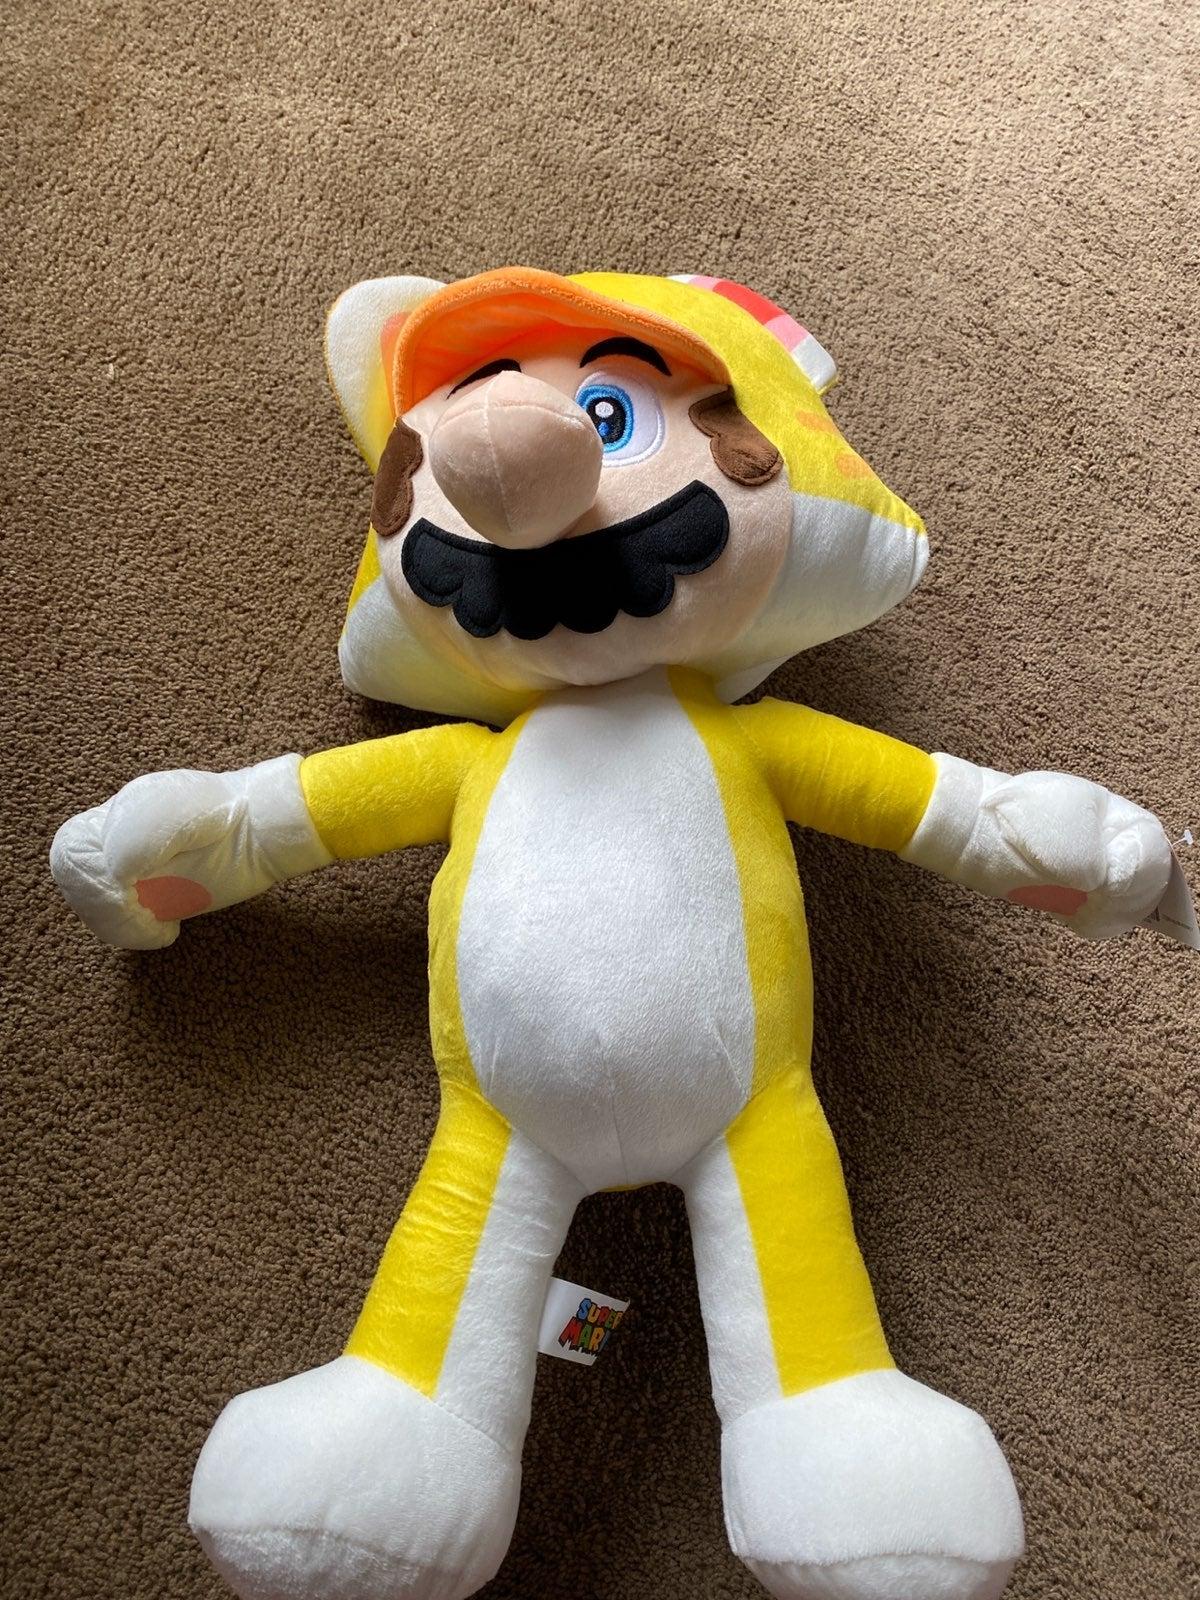 Huge Mario Cat Plush! (Over 2ft)!